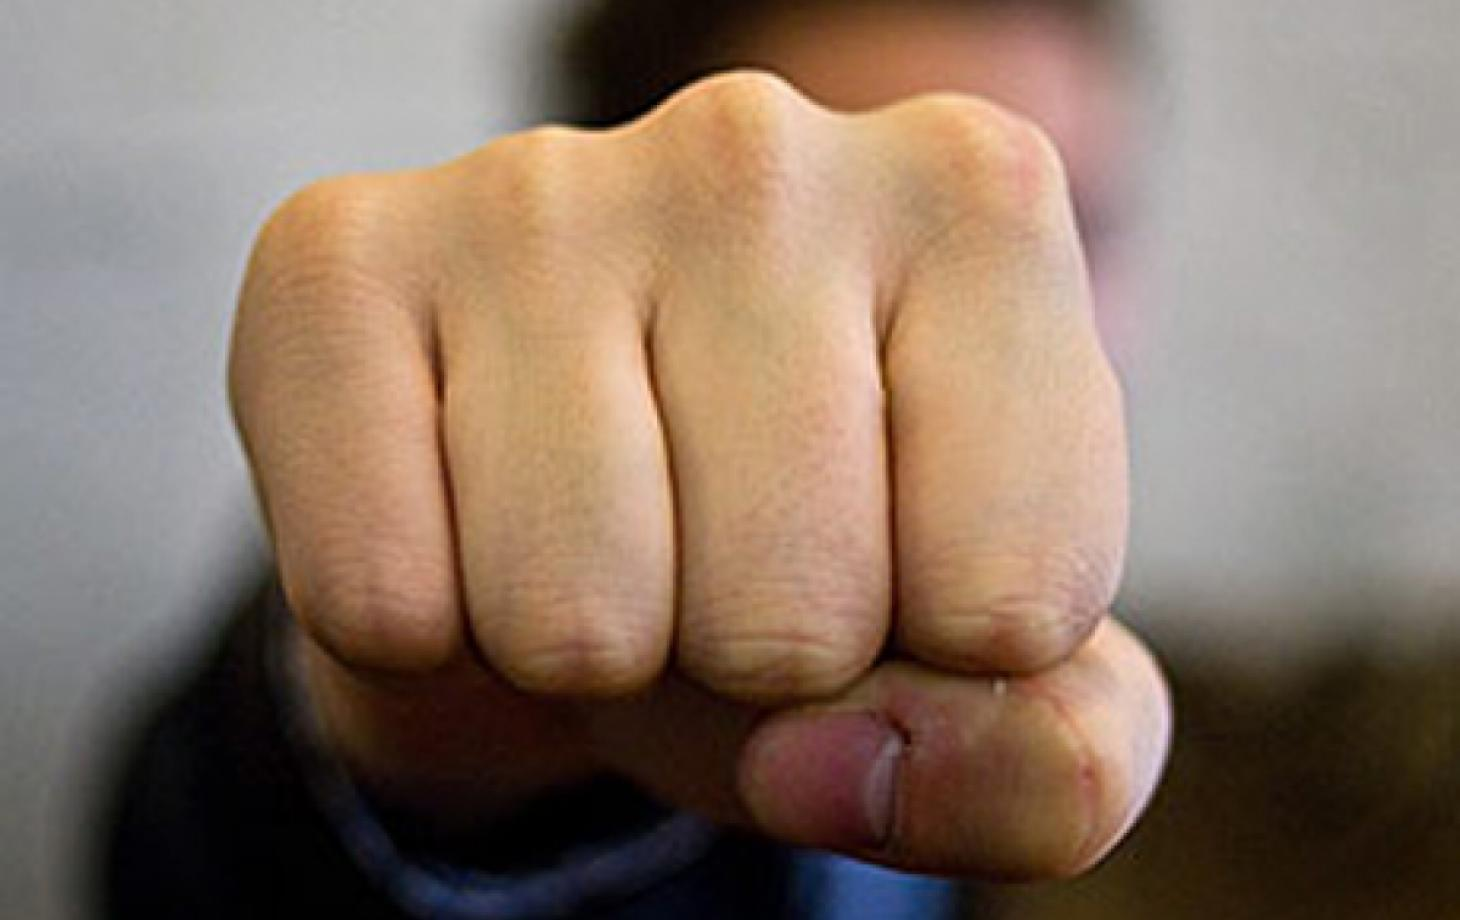 Хулигана изЧебоксара осудят заизбиение депутата государственного совета  Чувашии